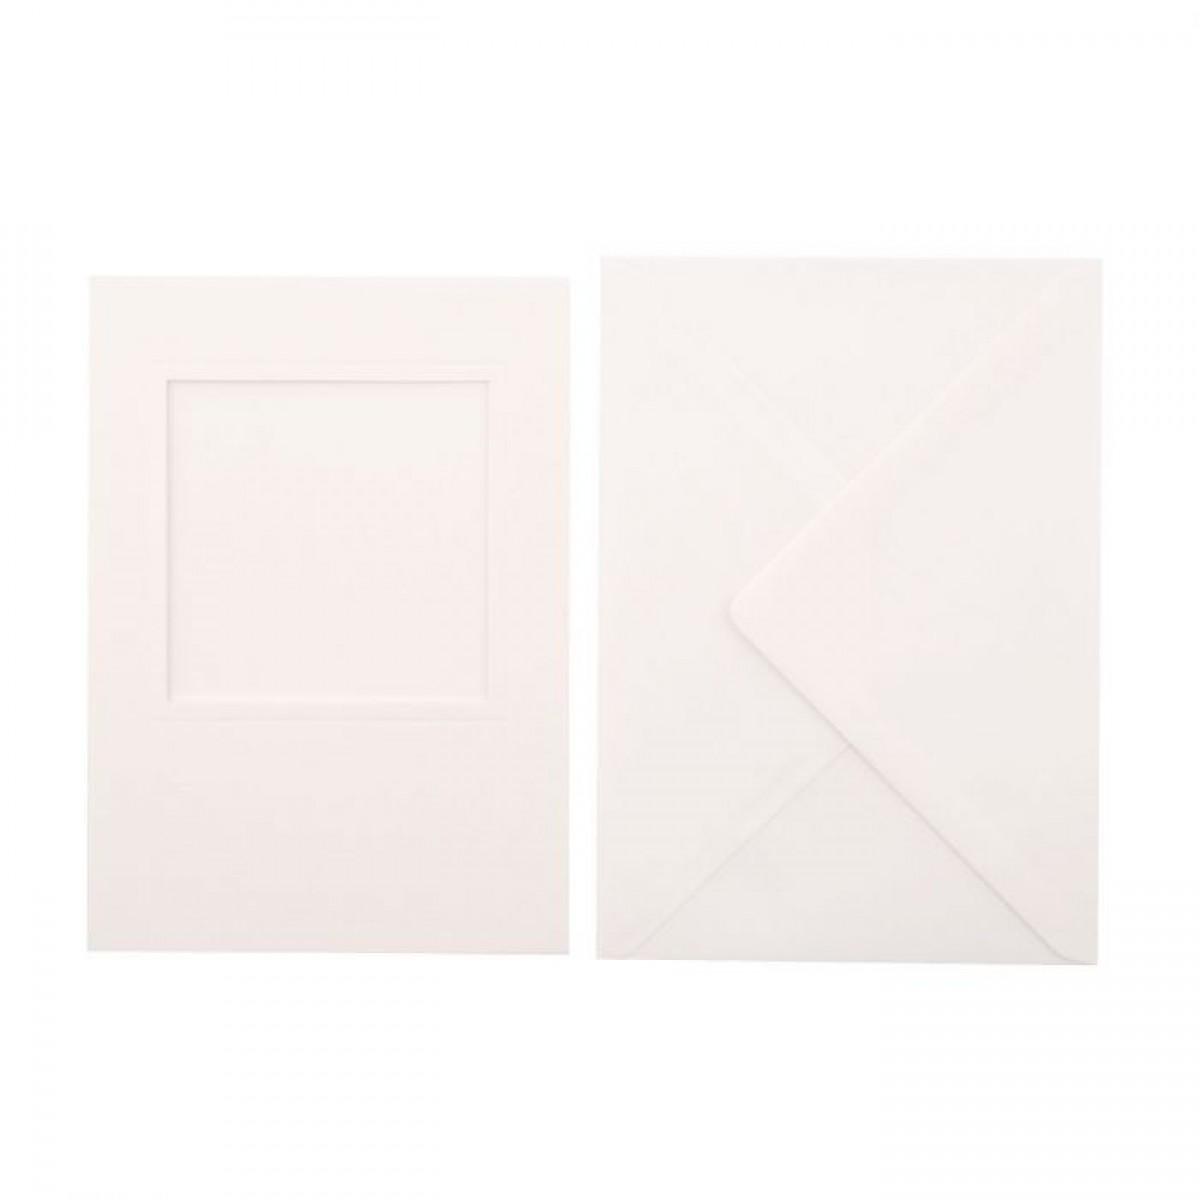 Passepartout kort og kuvert, A6, 5 stks